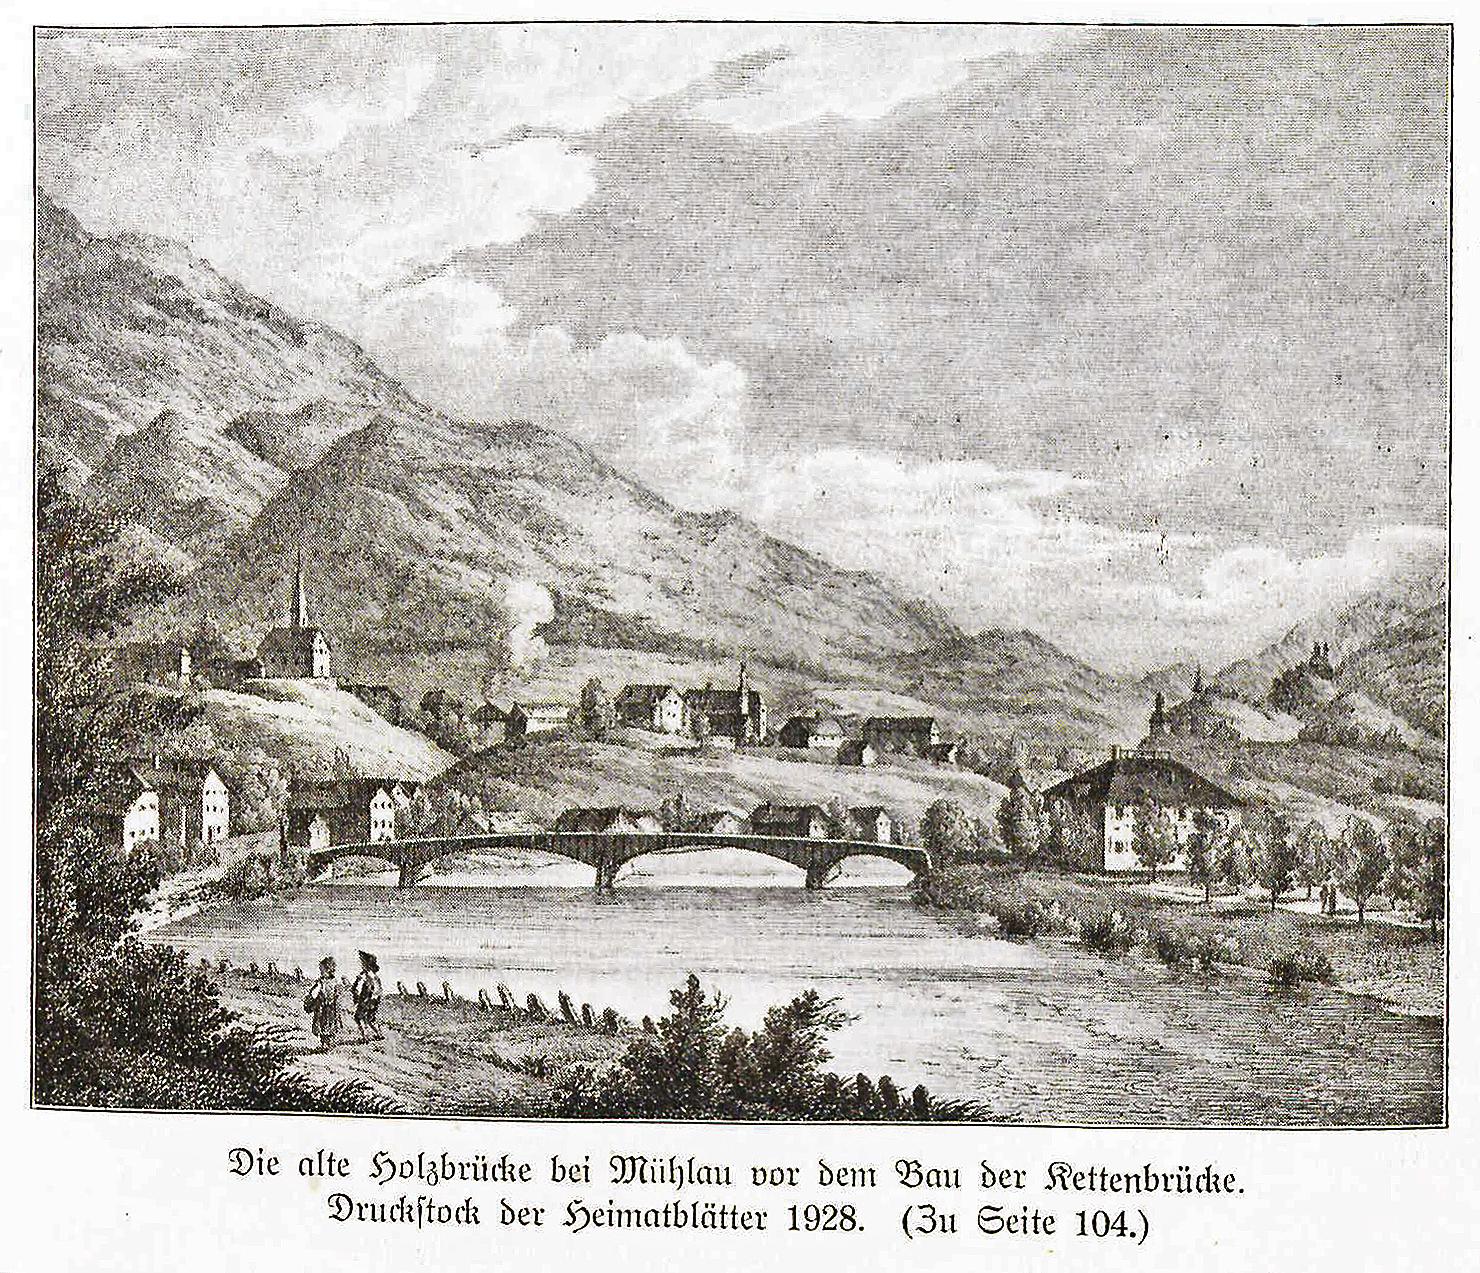 Mühlauer (Holz)Brücke ca 1600